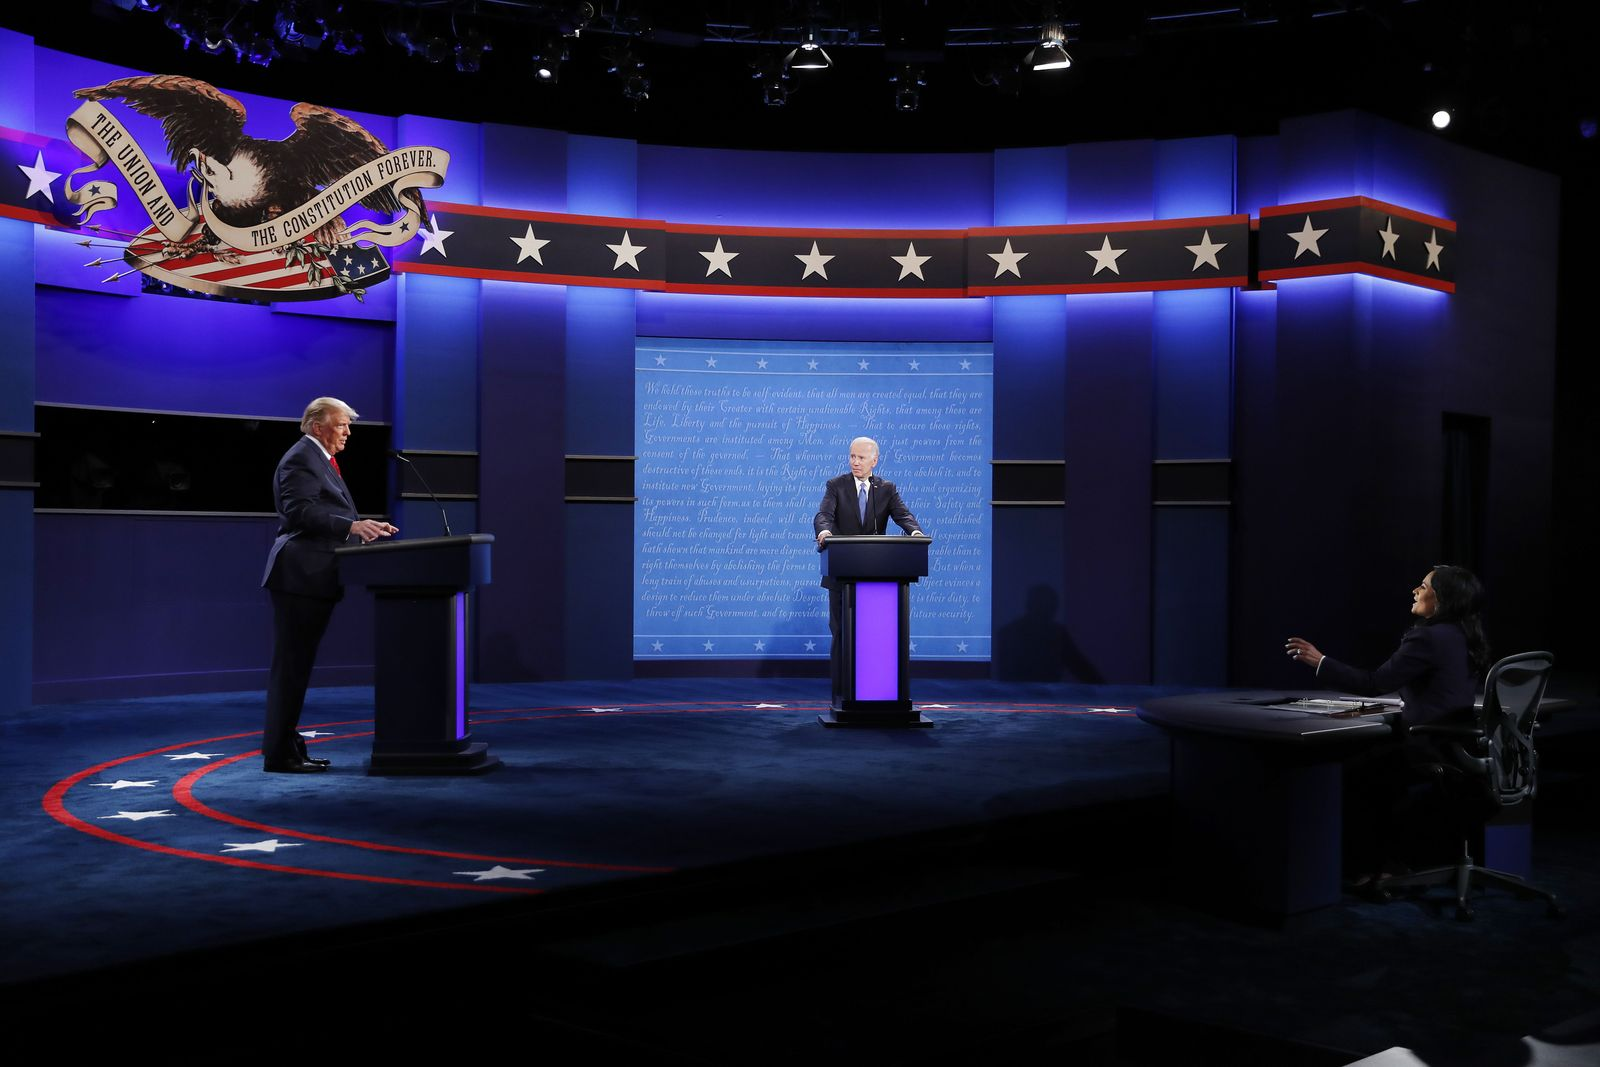 Final presidential debate between US President Donald J. Trump and Democratic candidate Joe Biden at Belmont University, Nashville, USA - 22 Oct 2020